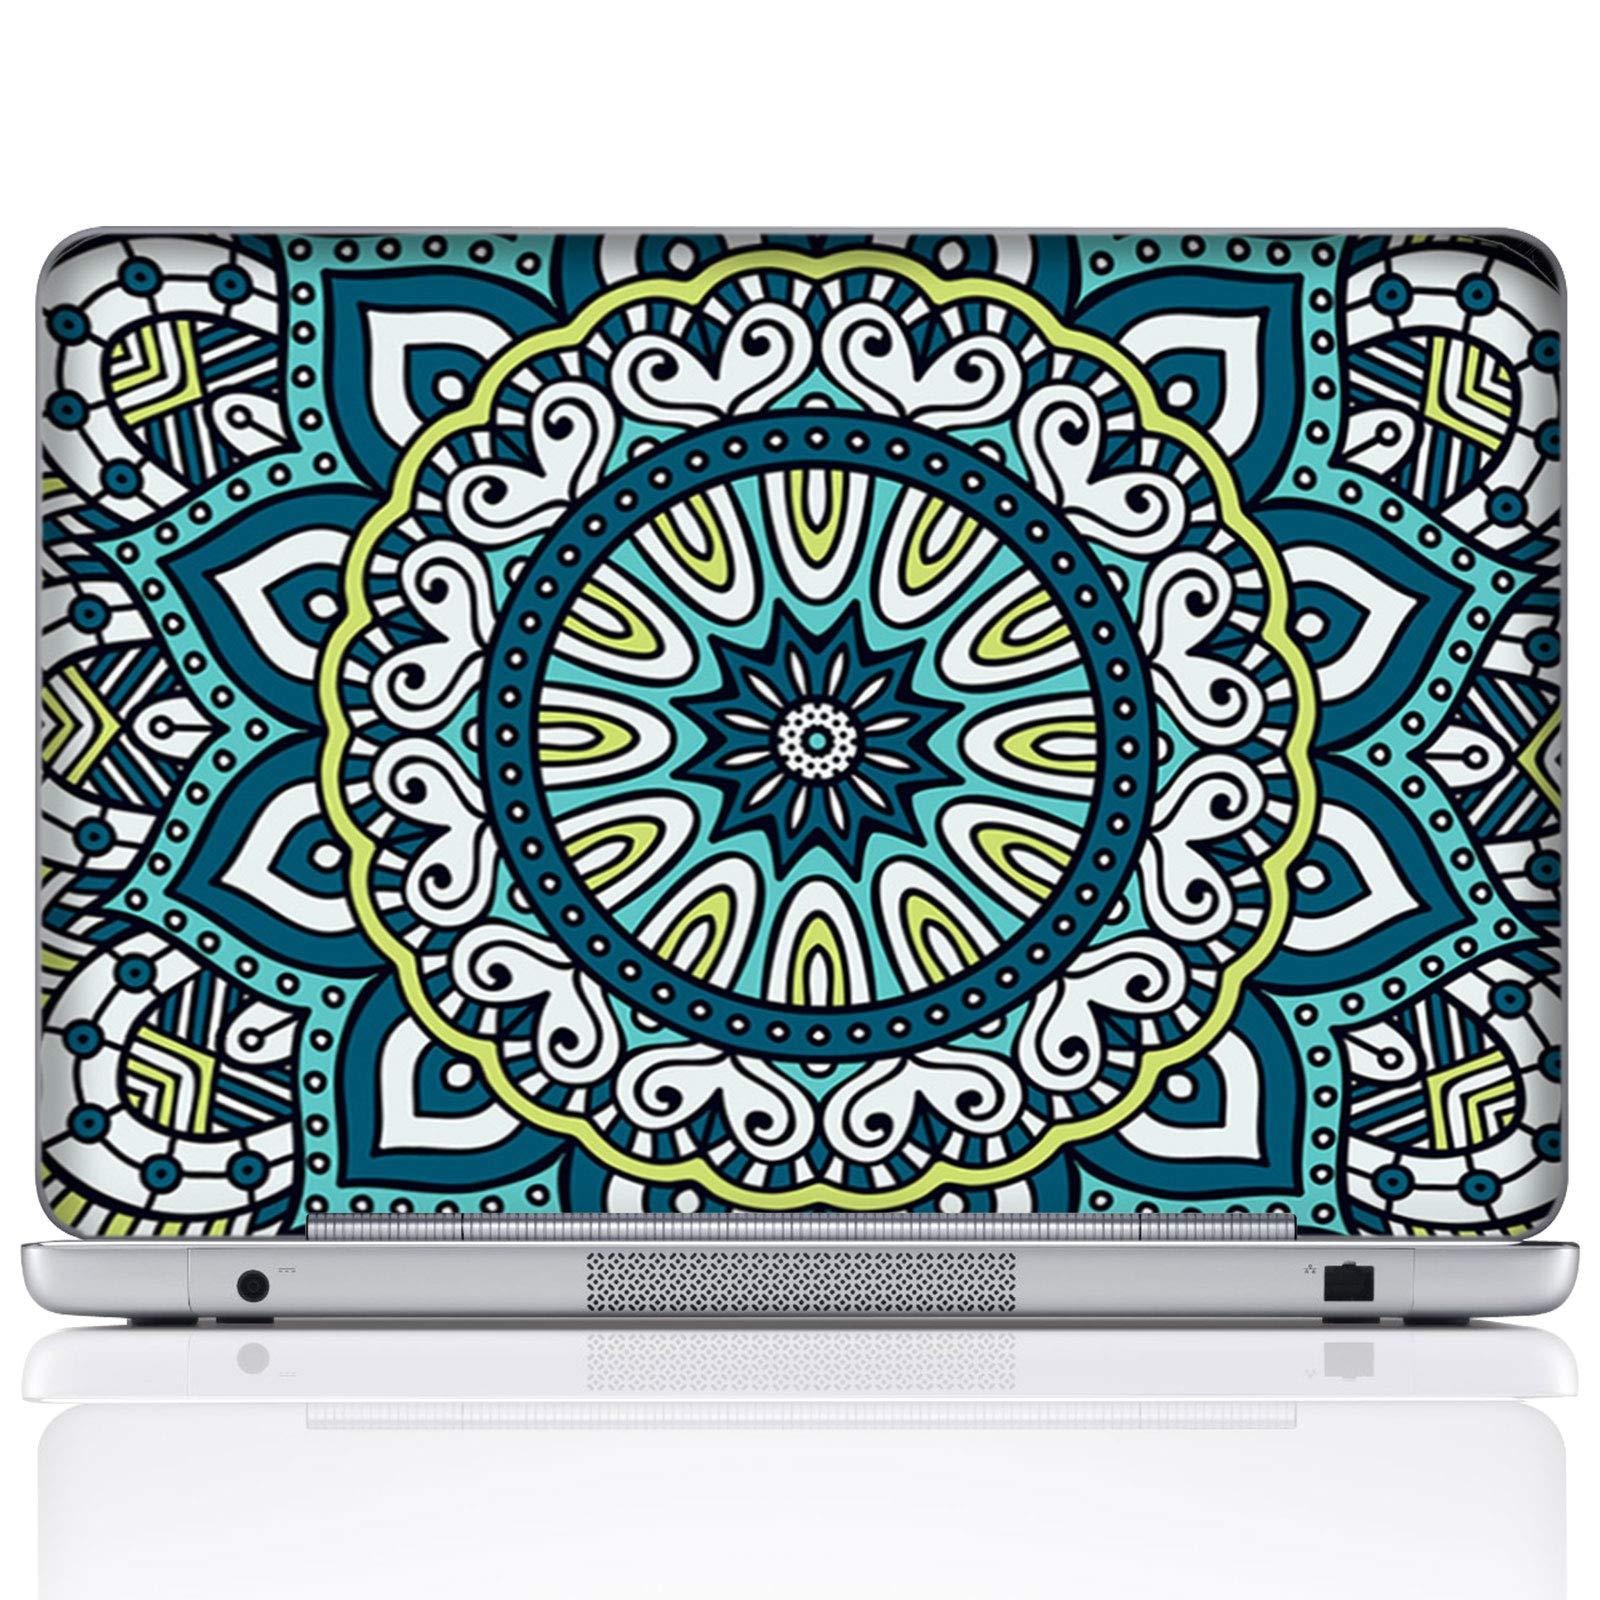 Meffort Inc 15 15.6 Inch Laptop Notebook Skin Sticker Cover Art Decal (Included 2 Wrist pad) - Mandala Design